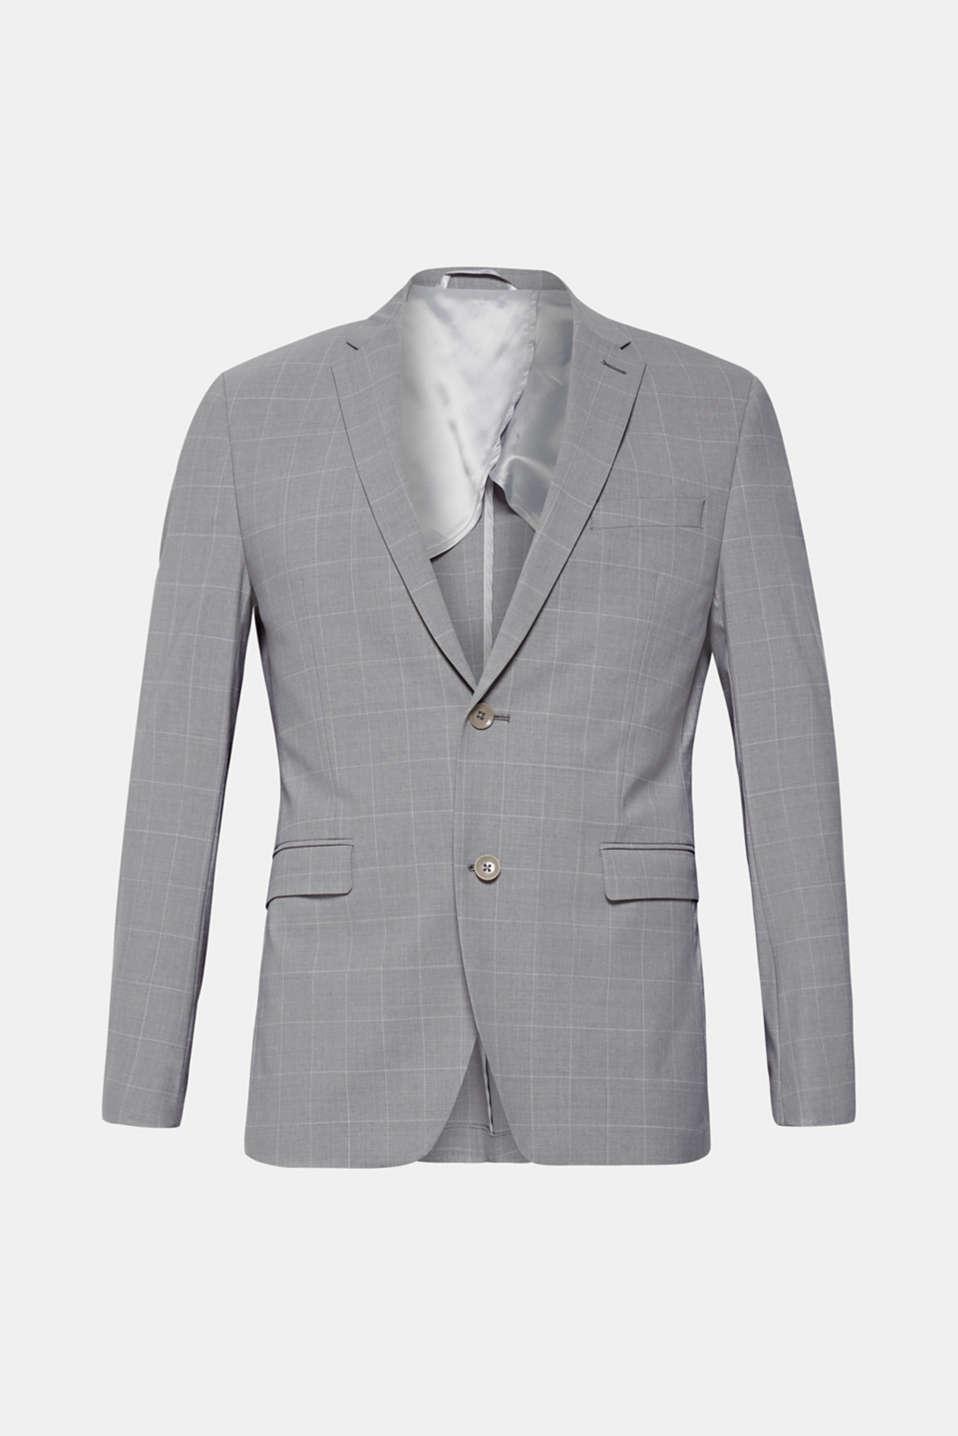 Blazers suit, LIGHT GREY, detail image number 7